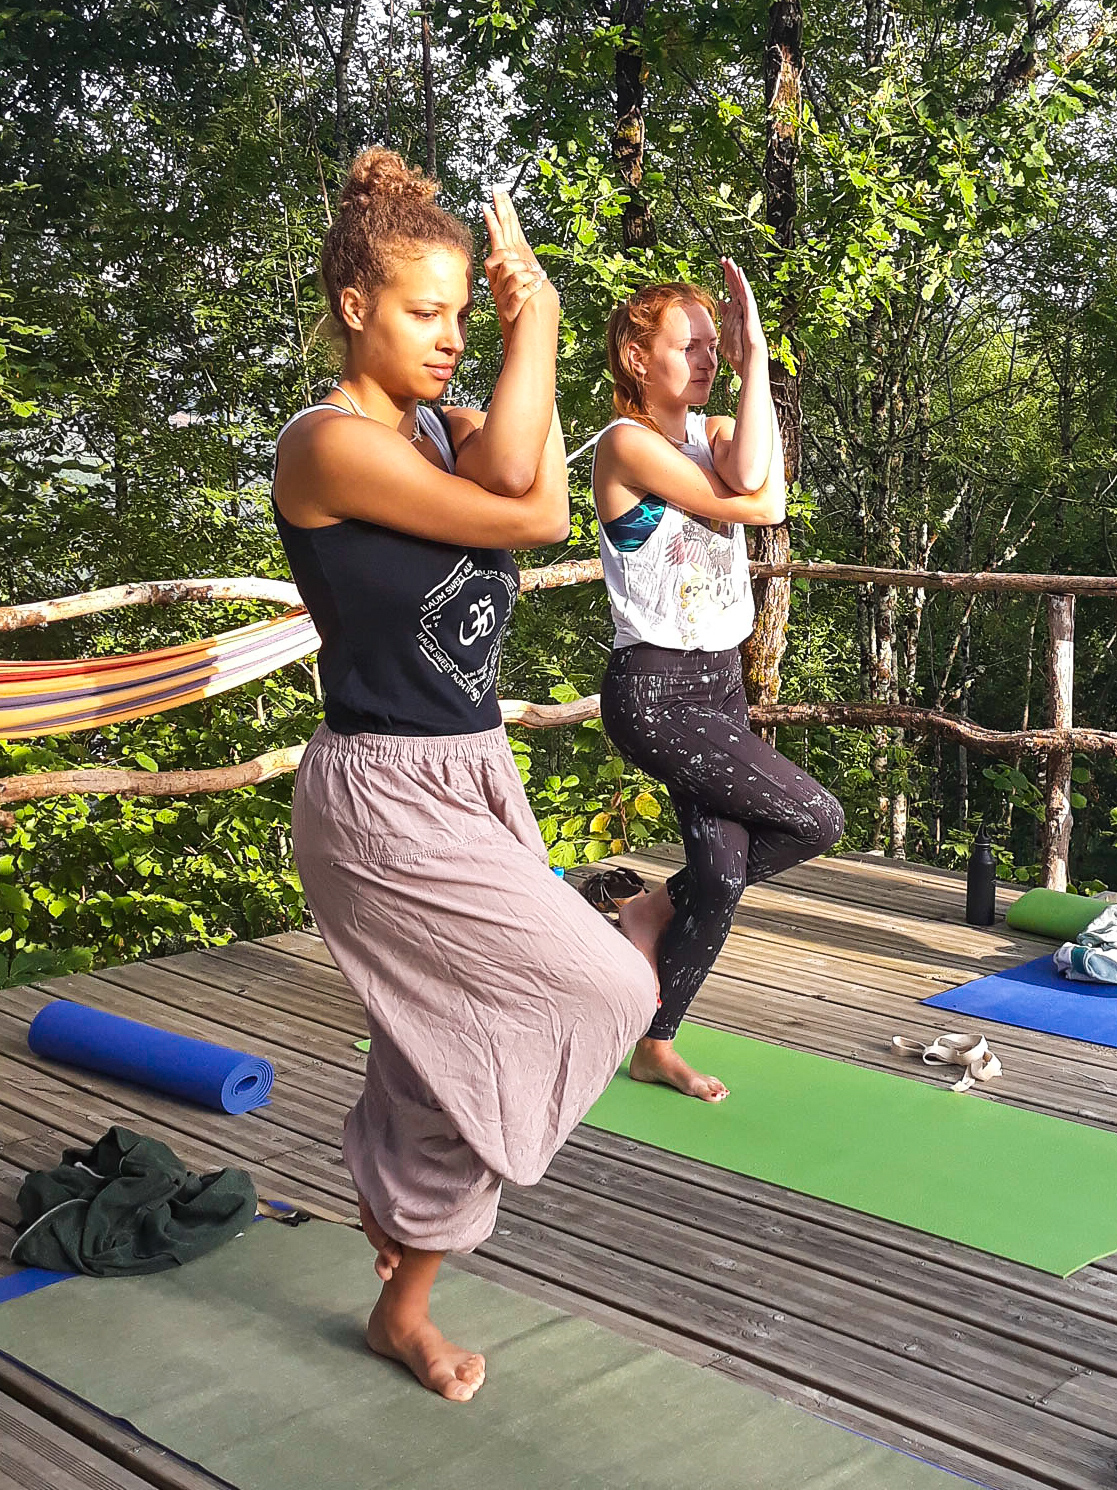 A Bespoke Yoga Practice